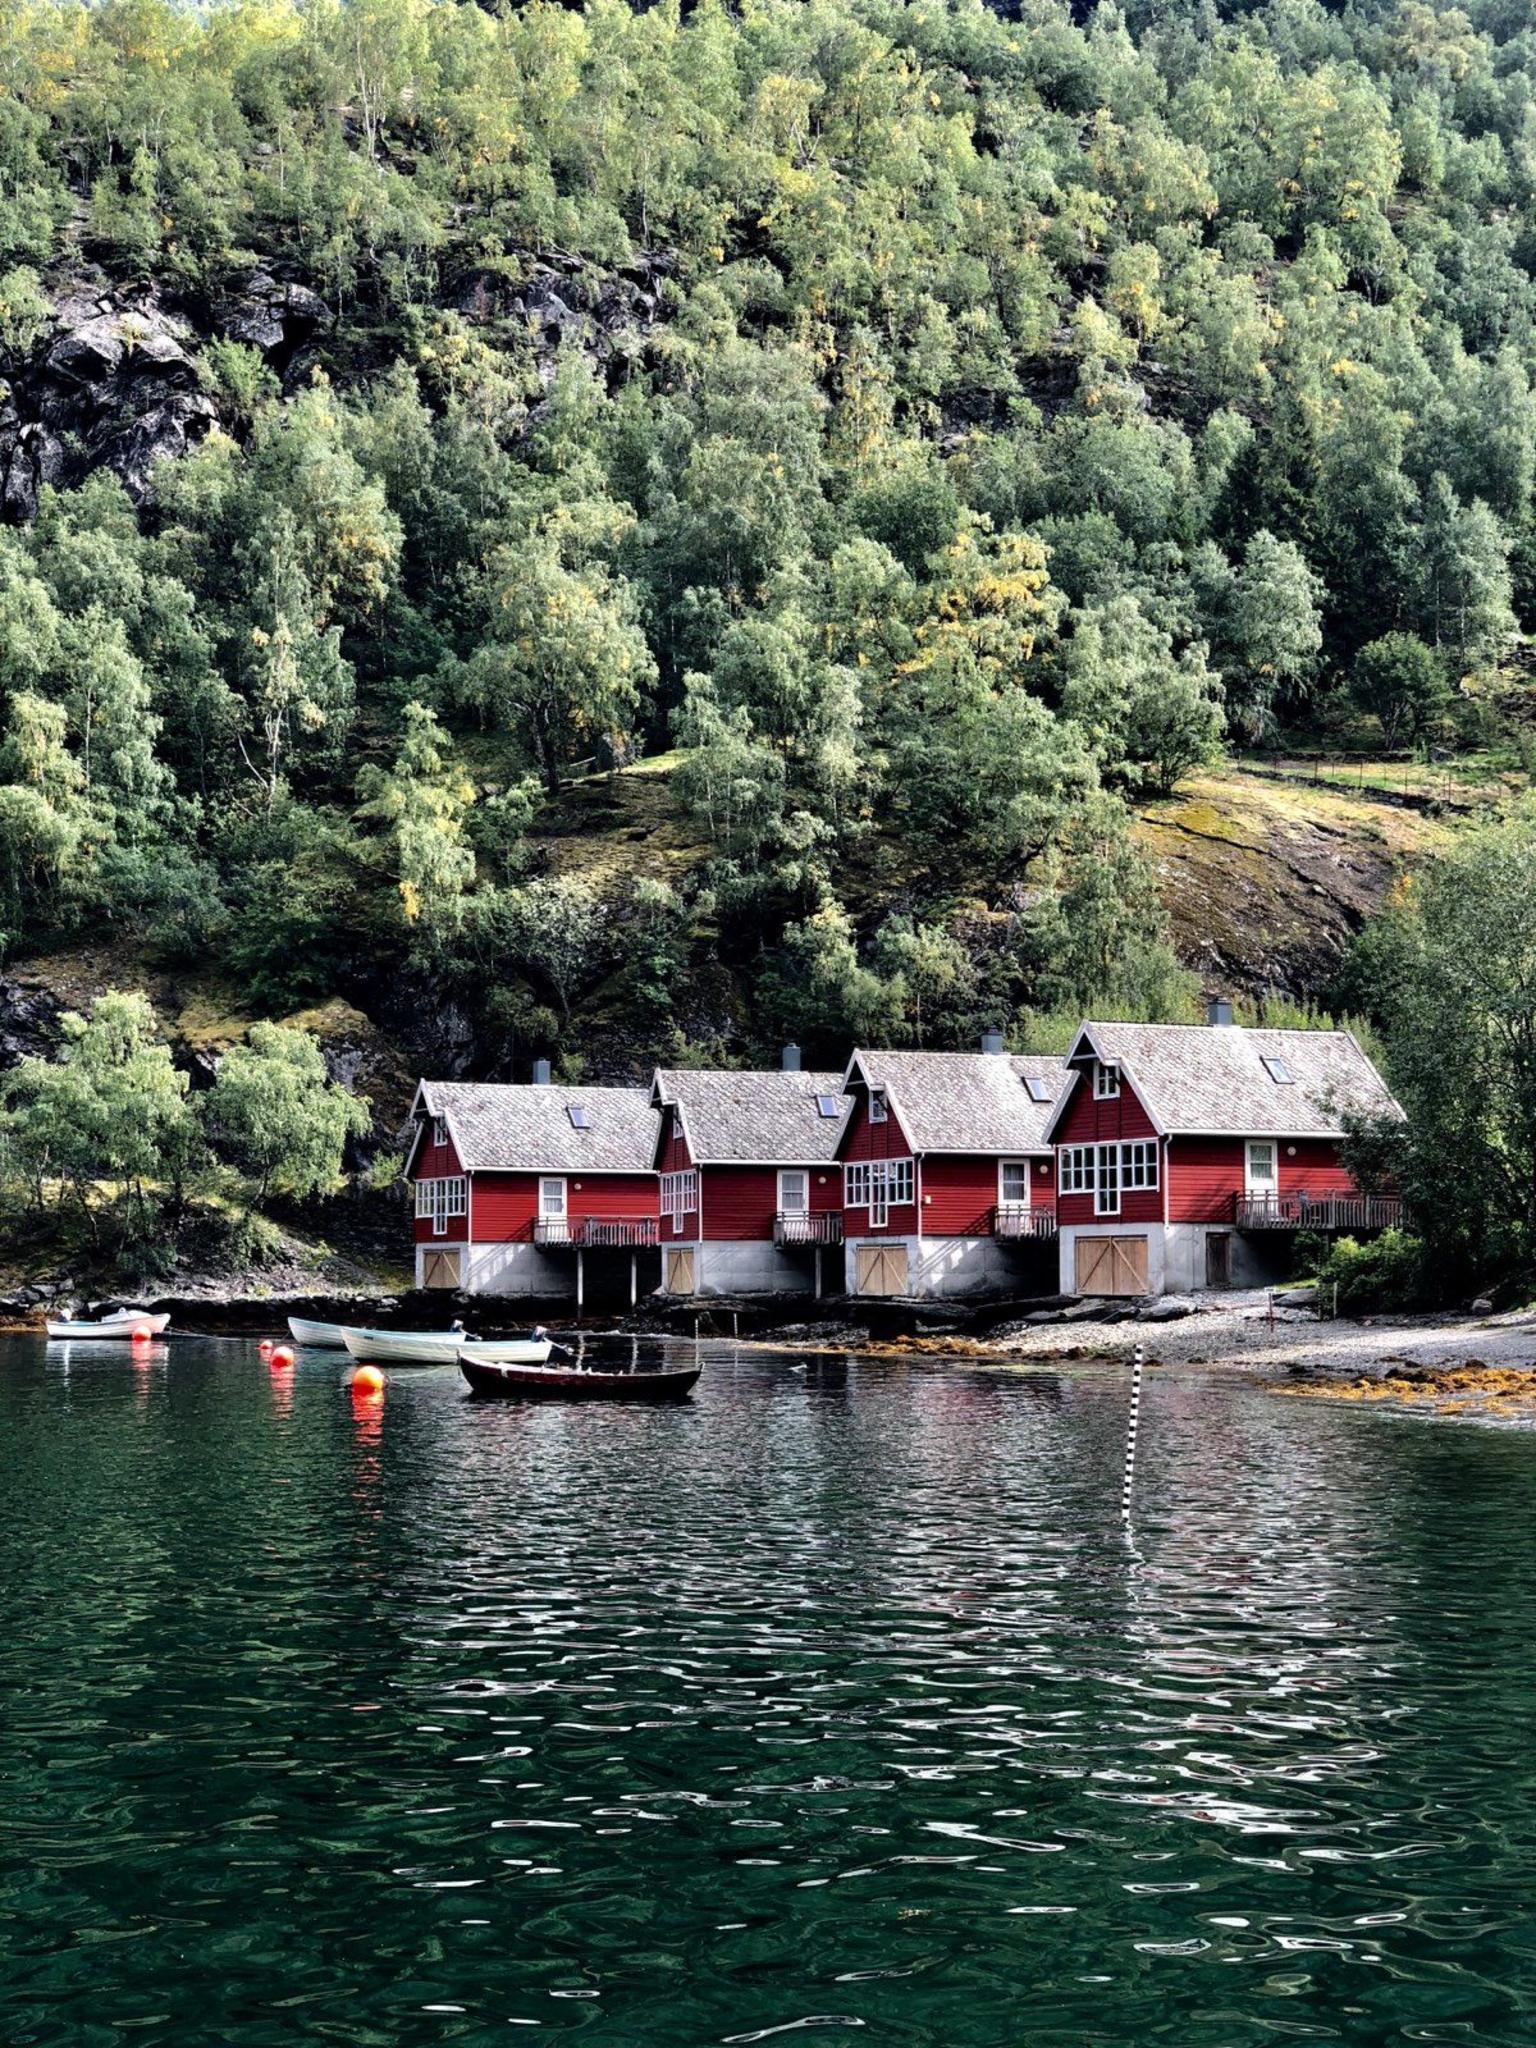 MÁS FOTOS, The Scenic Roadtrip - Oslo to Bergen via the fjords by private van